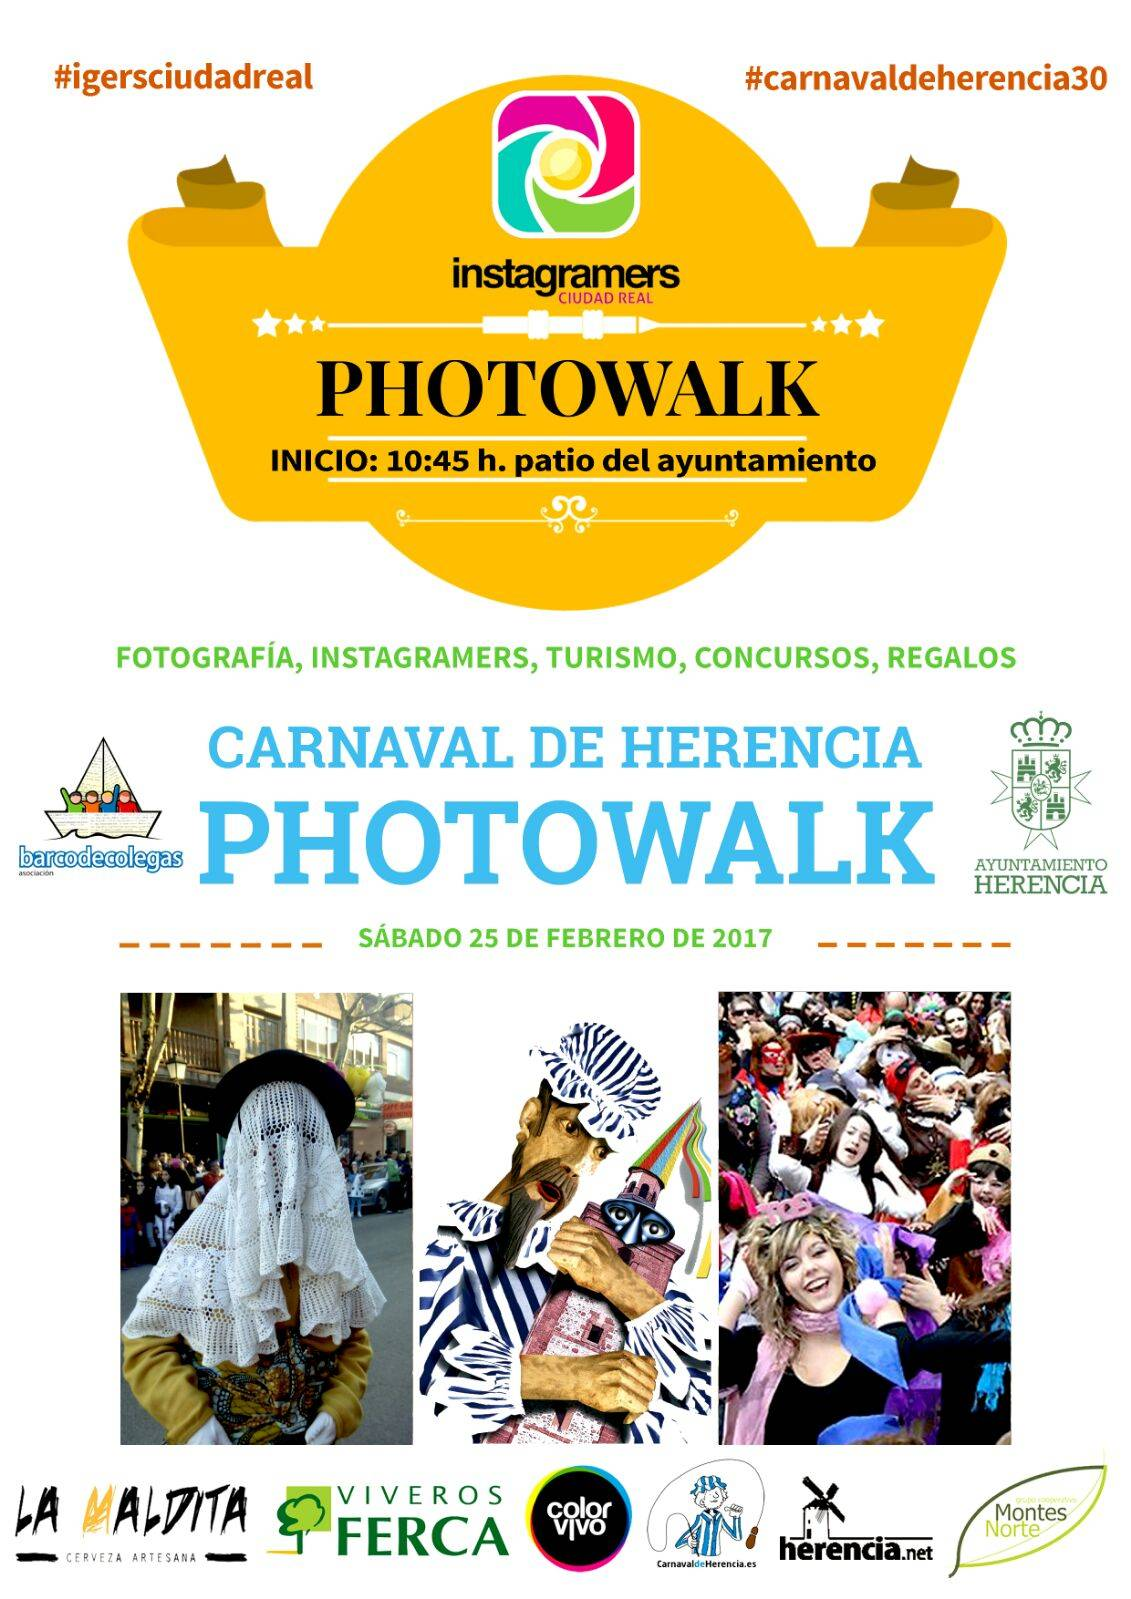 Cartel Photowalk Instagramers Carnaval de Herencia - El Carnaval de Herencia será punto de encuentro para los instagramers